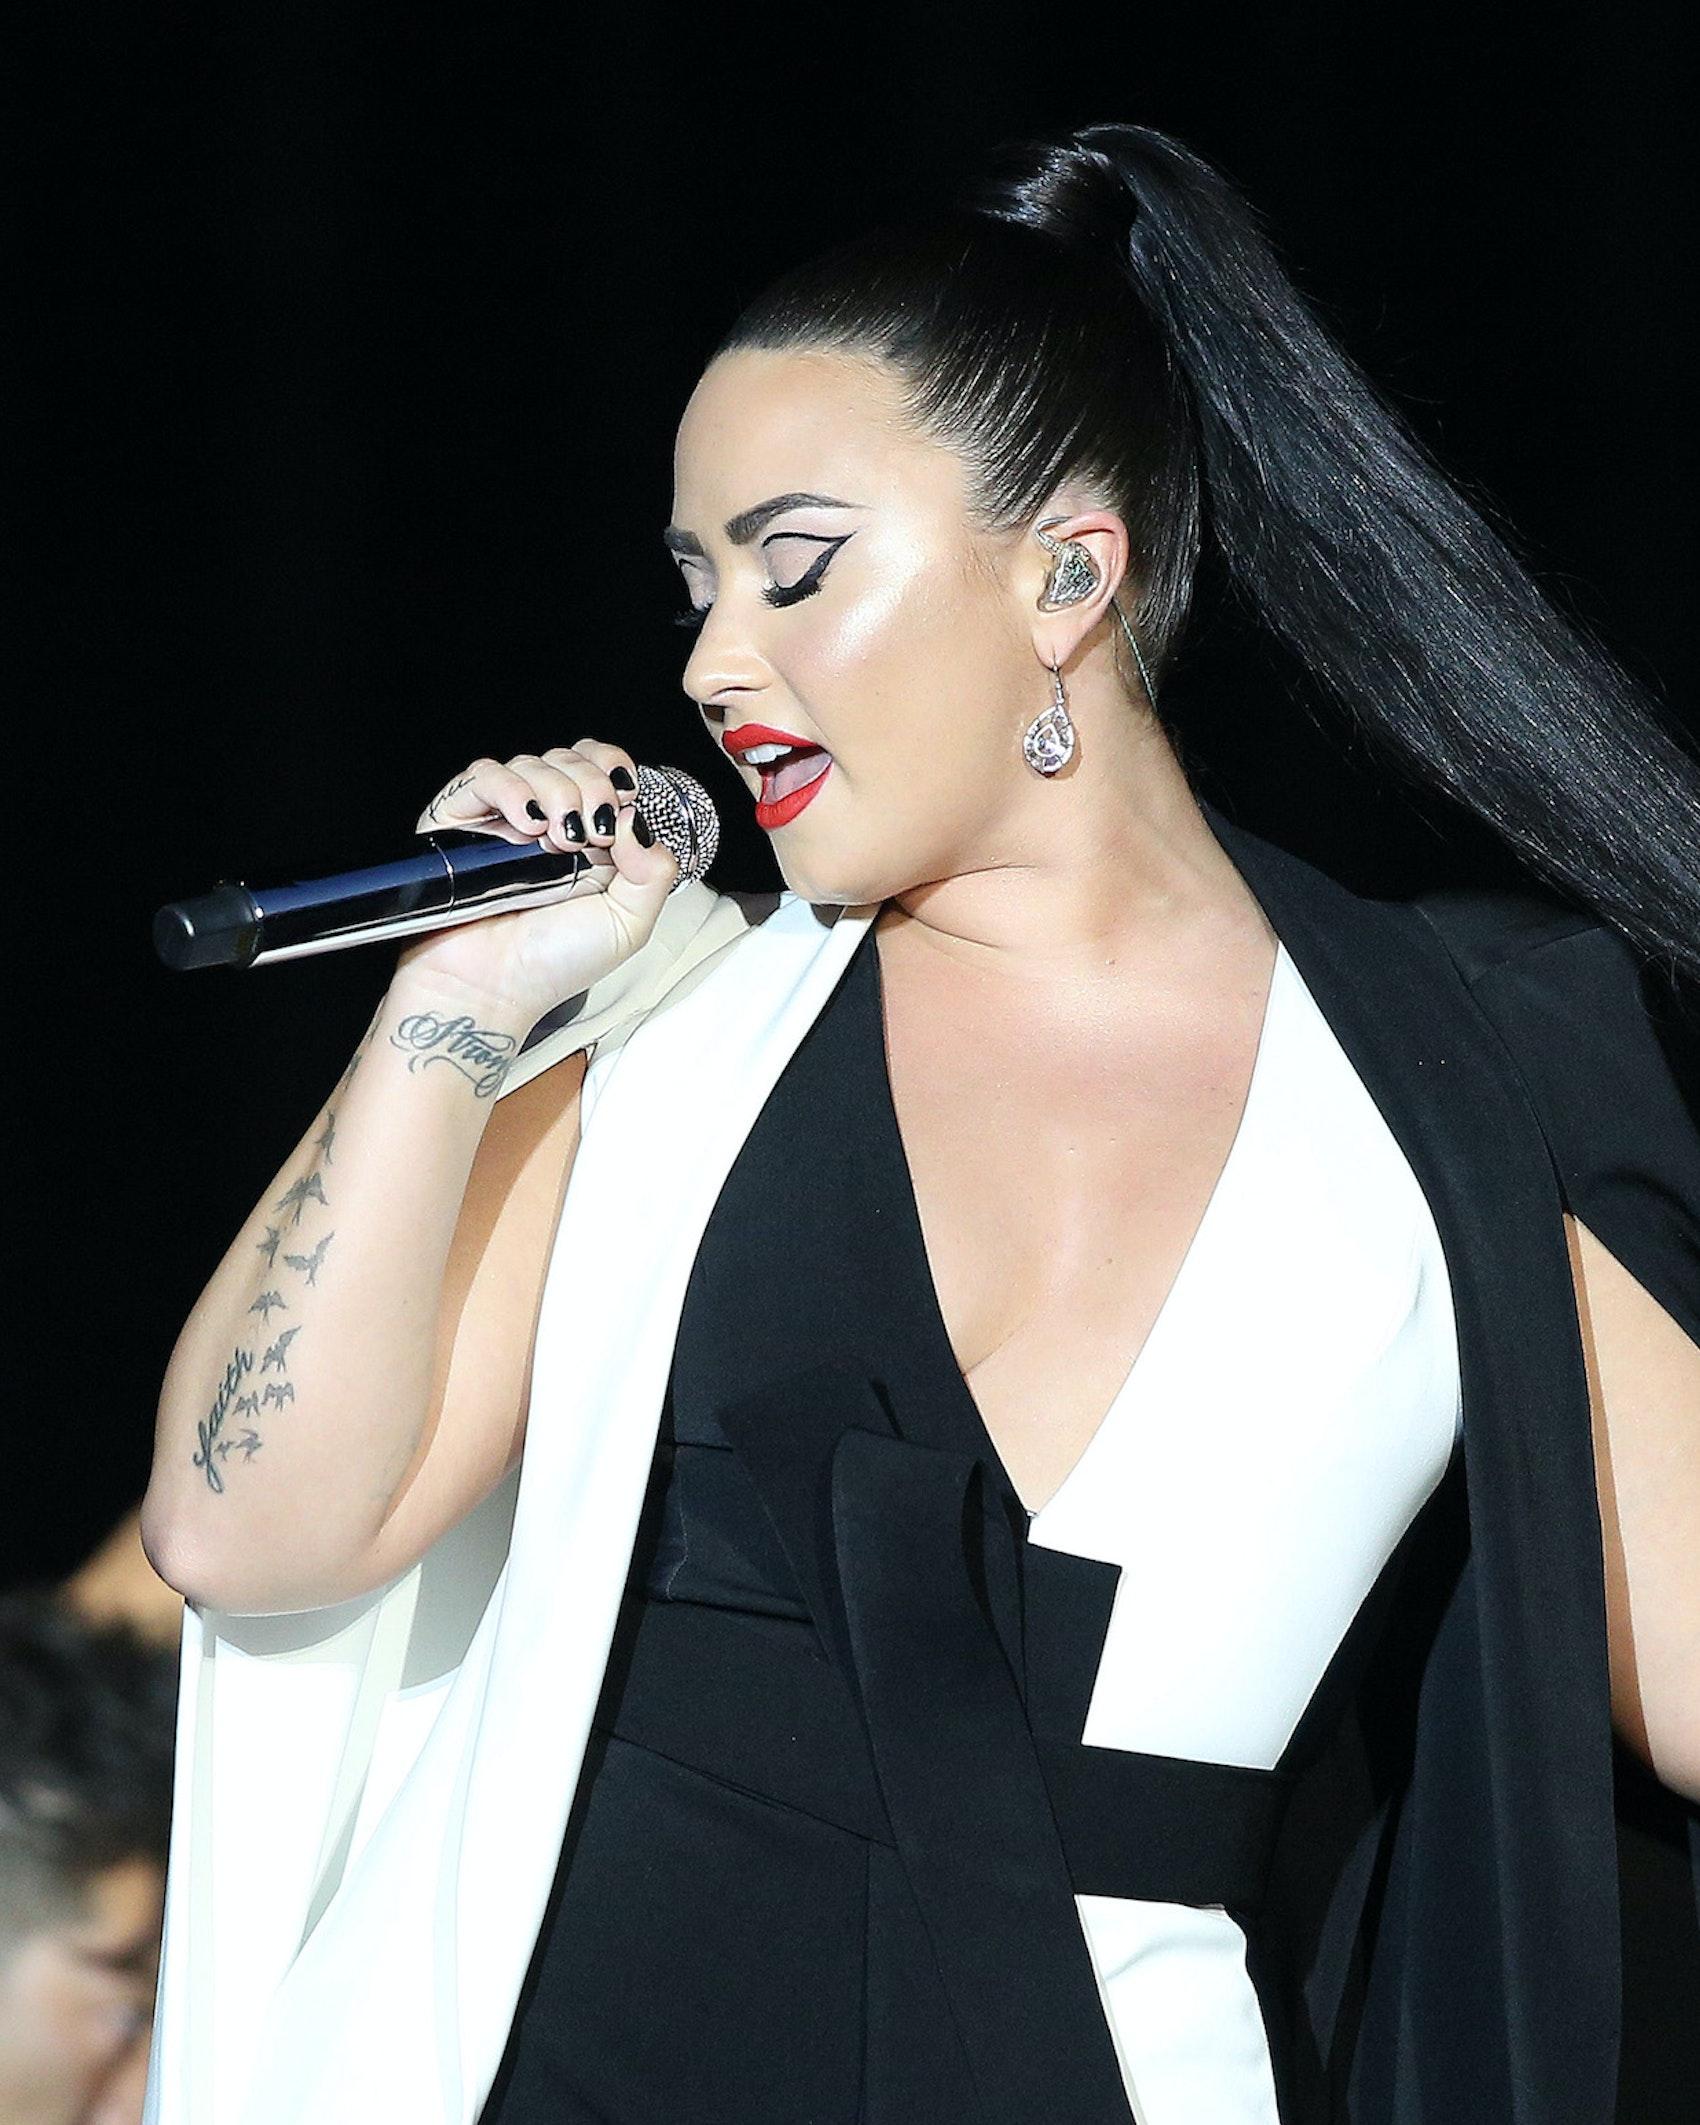 US singer Demi Lovato performs at the Rock in Rio Lisboa 2018 music festival in Lisbon, Portugal, on June 24, 2018. ( Photo by Pedro Fiúza/NurPhoto)